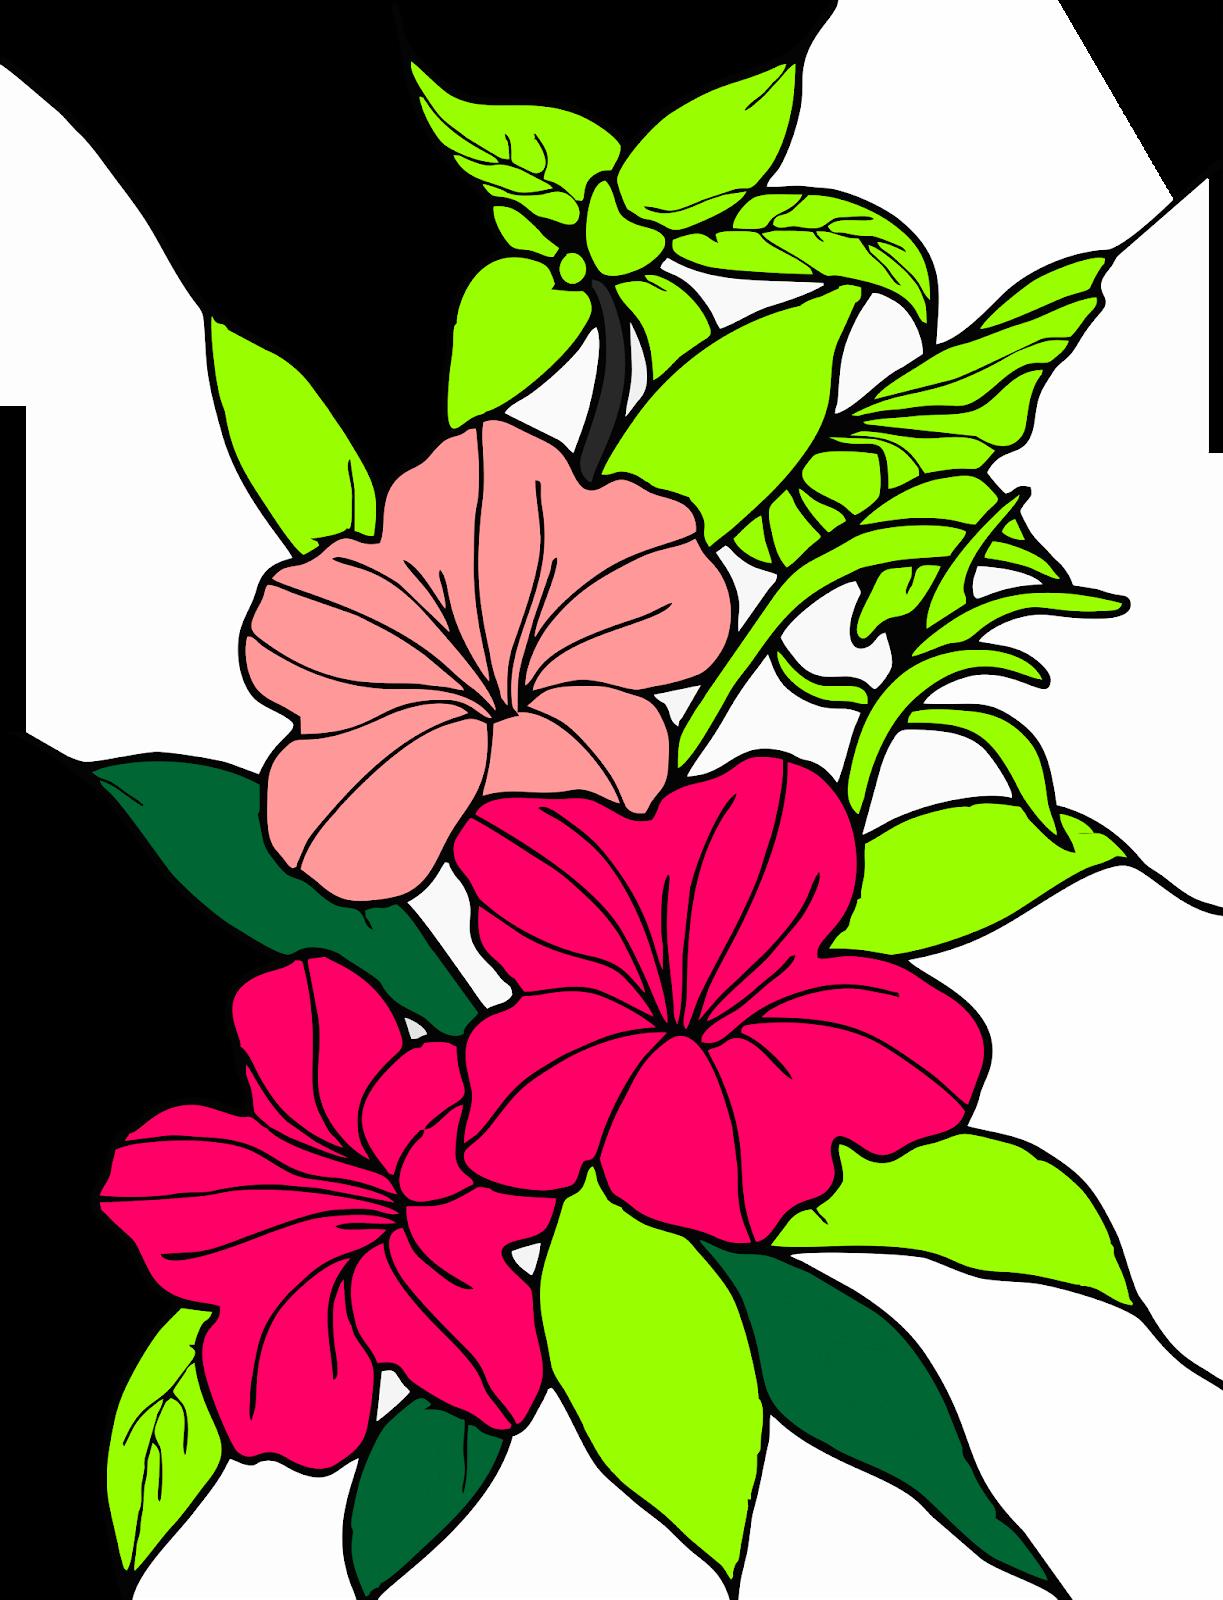 Contoh Gambar Bunga Kartun Gambar sketsa bunga mawar